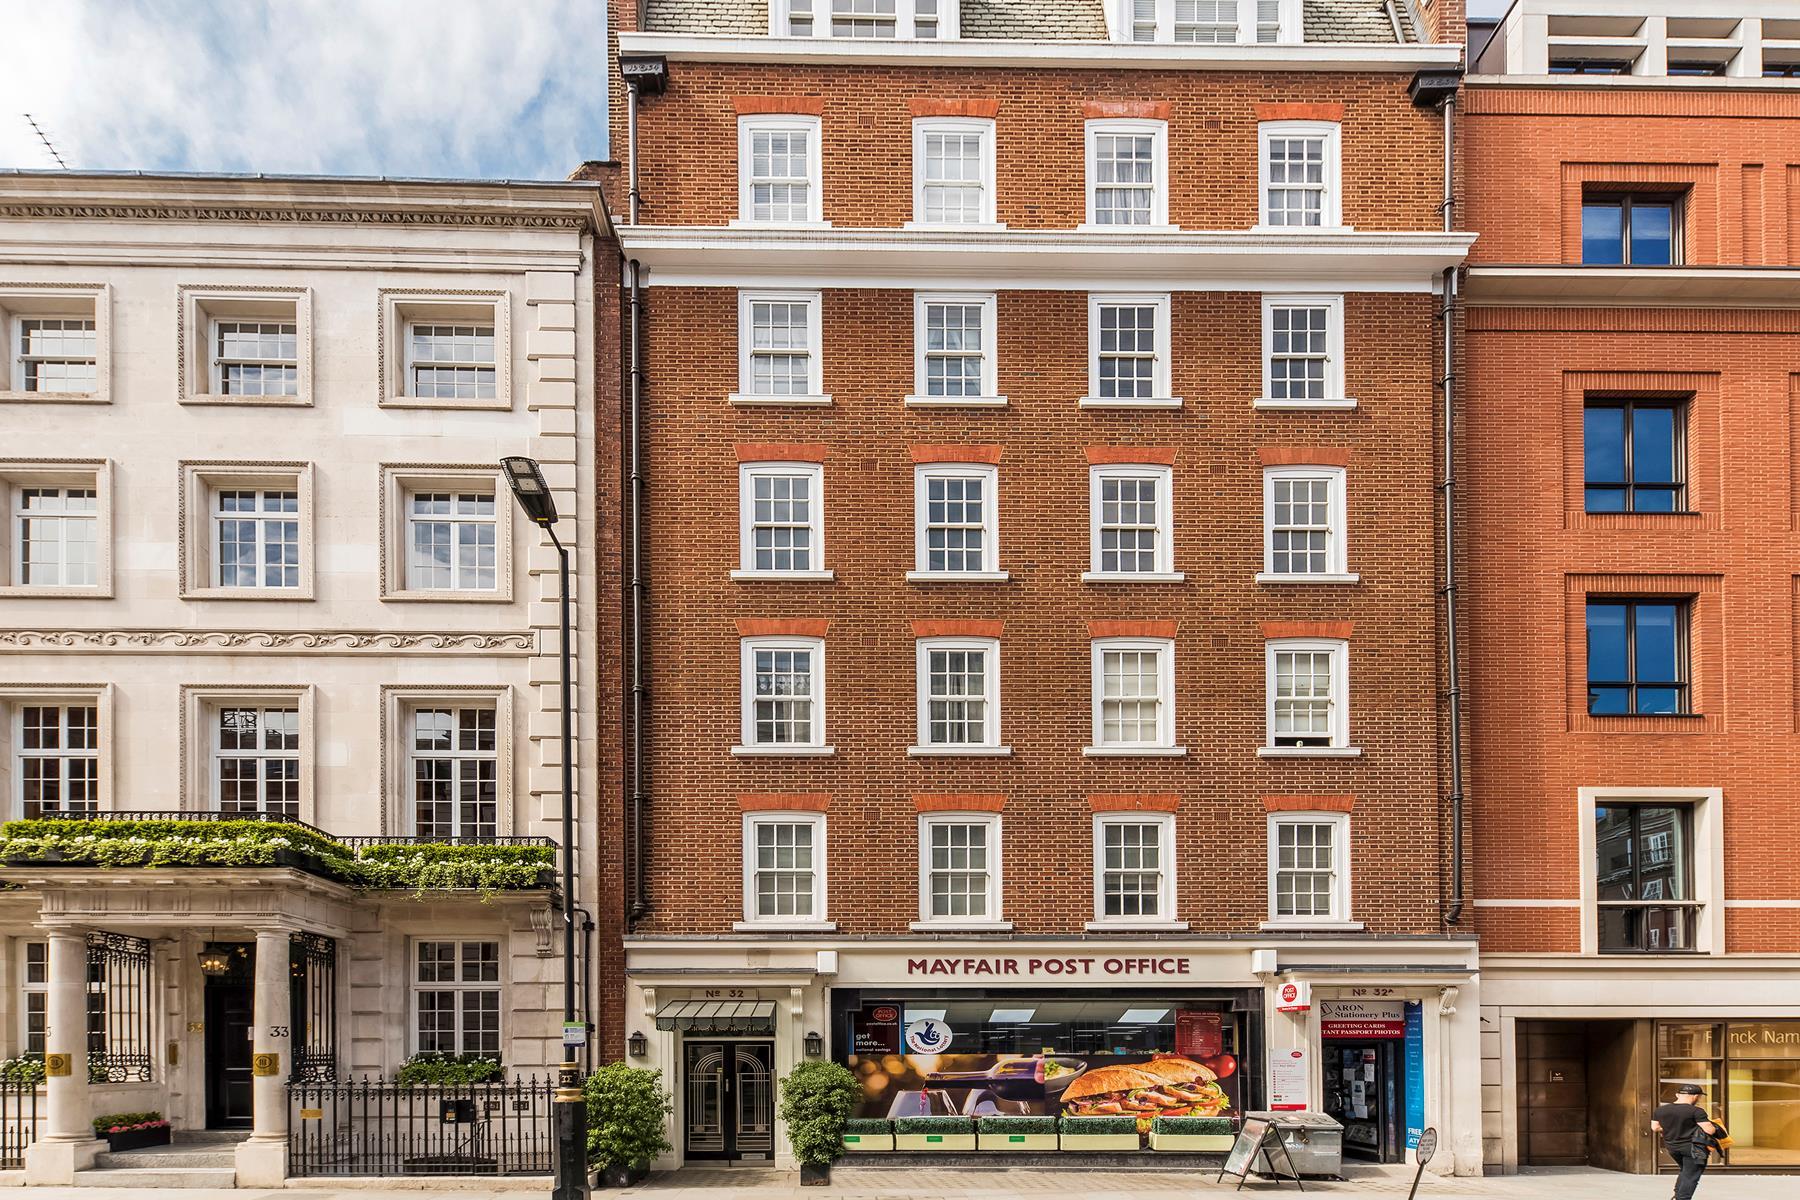 Grosvenor St, London W1K, UK - Source: Knight Frank